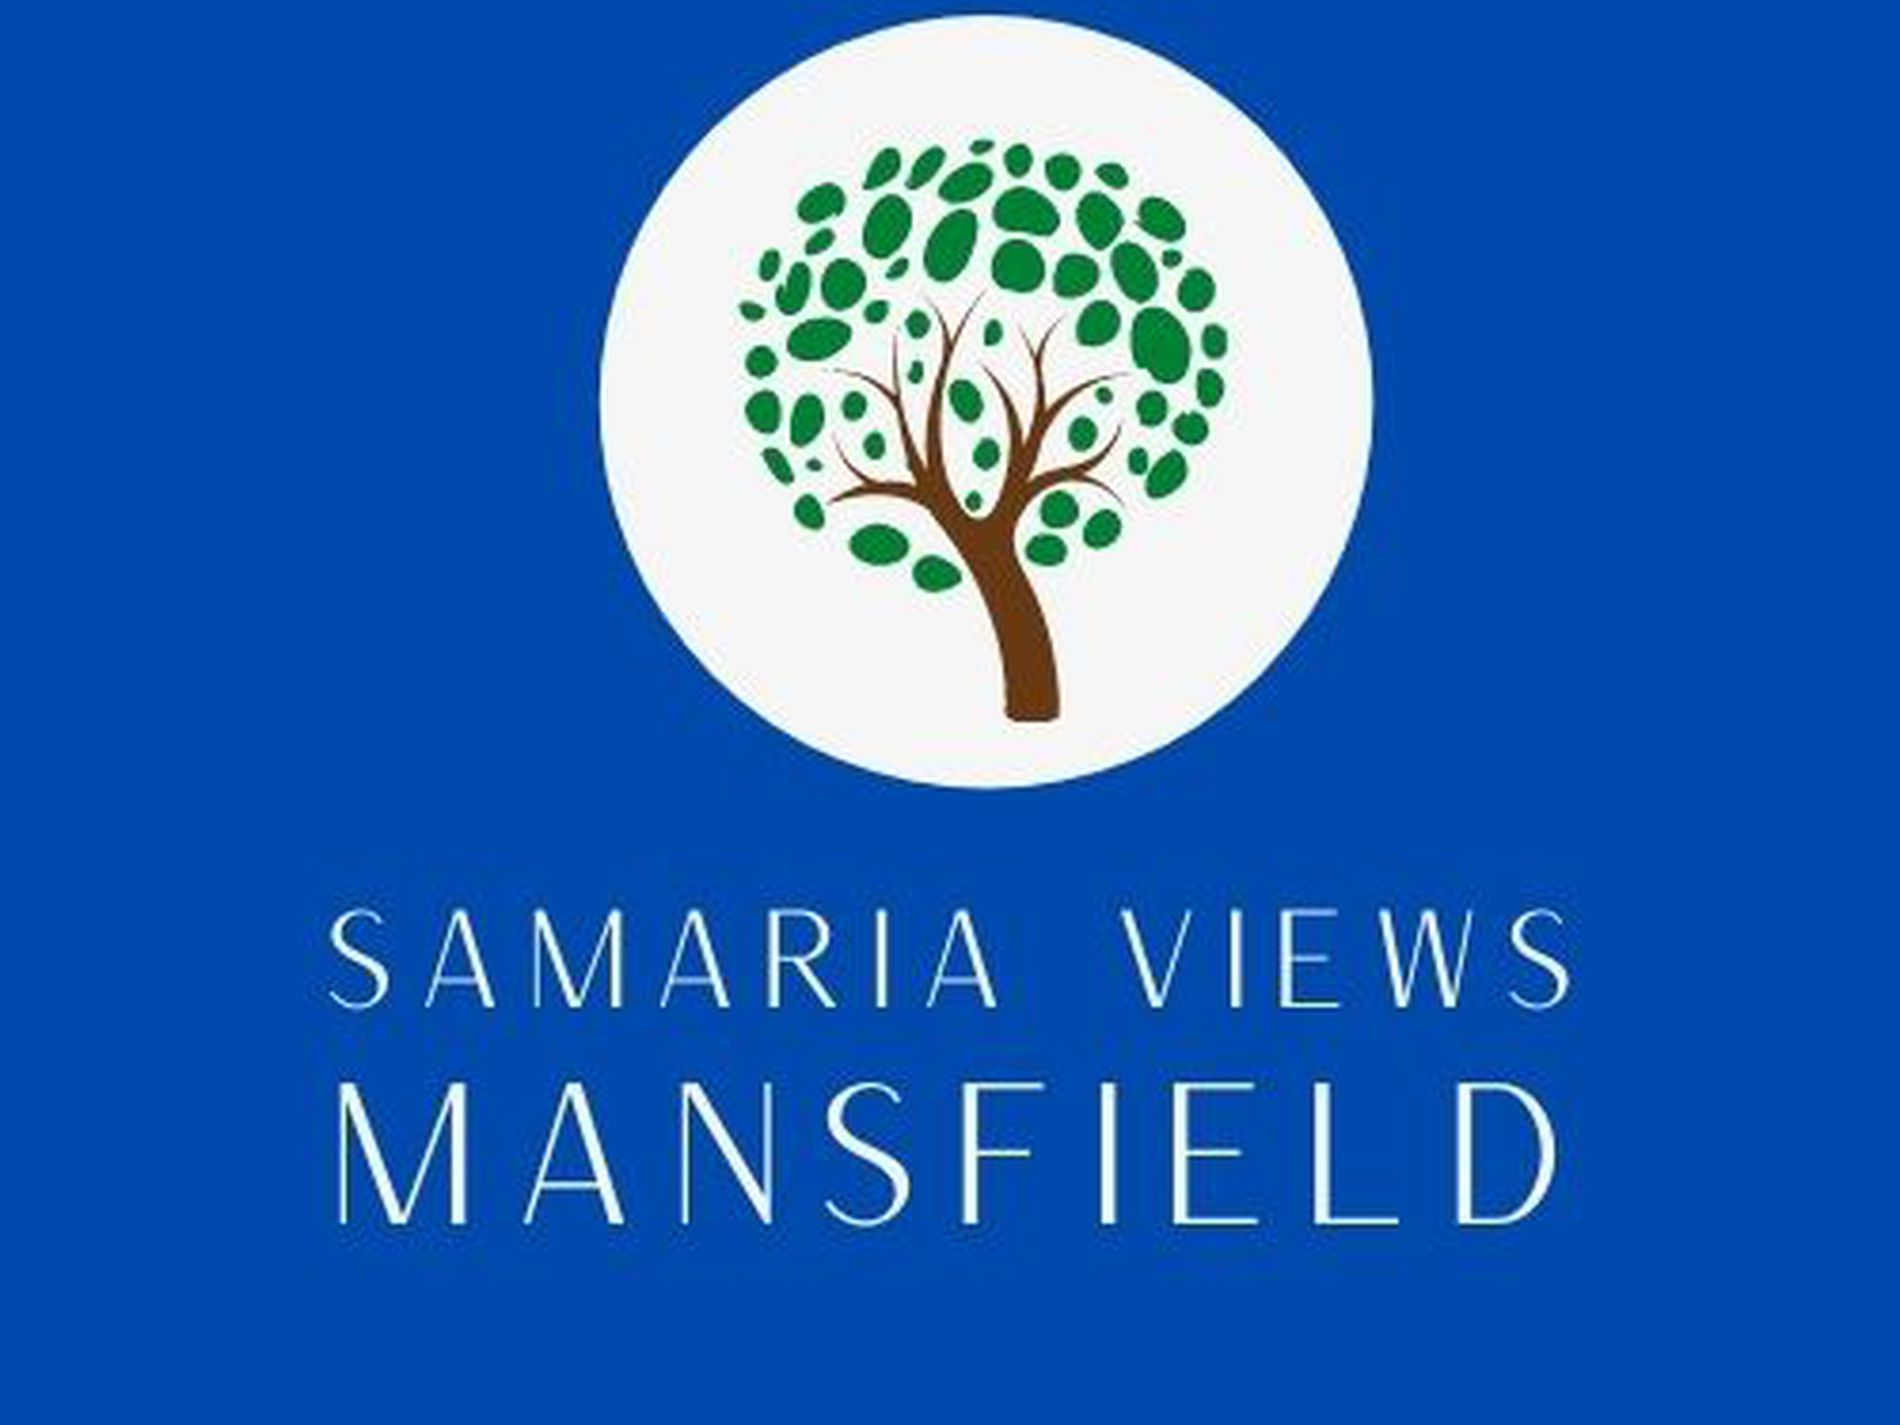 Lot 103, Samaria Views, Mansfield